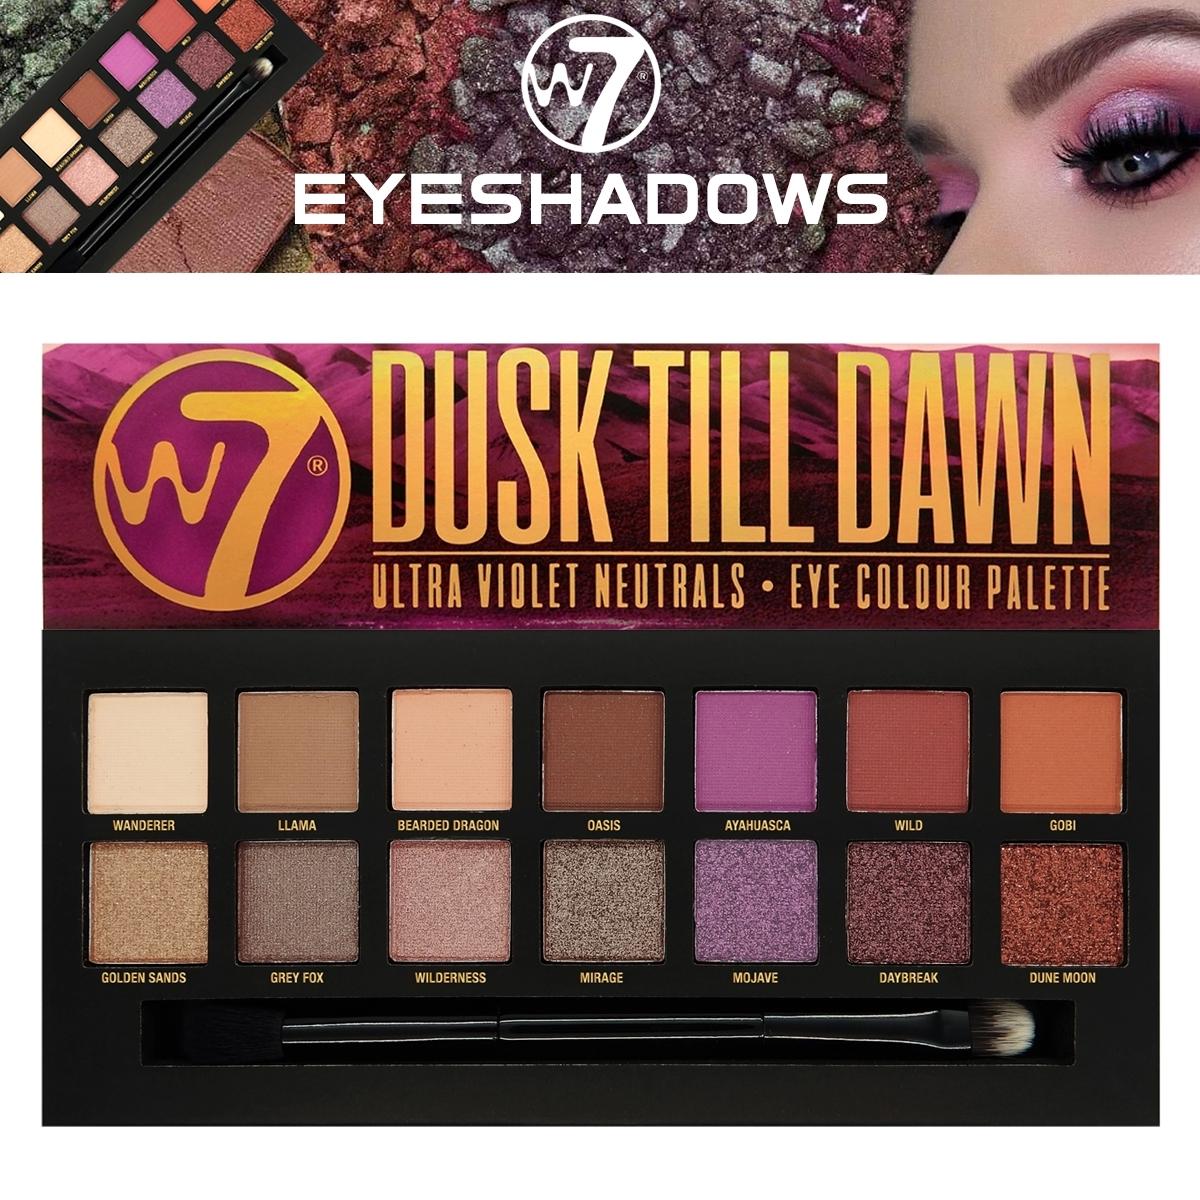 Just Essentials | W7 Dusk Till Dawn Eyeshadow Palette